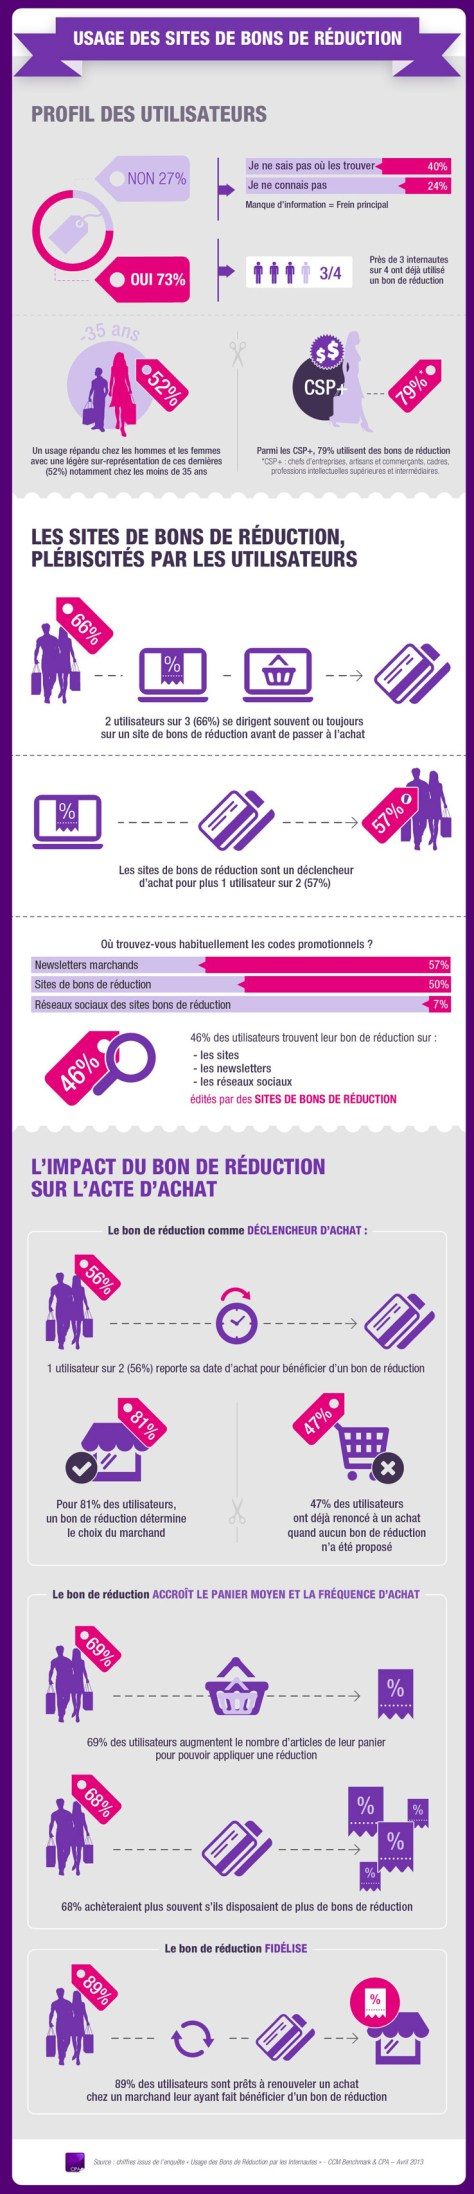 infographie-paylib